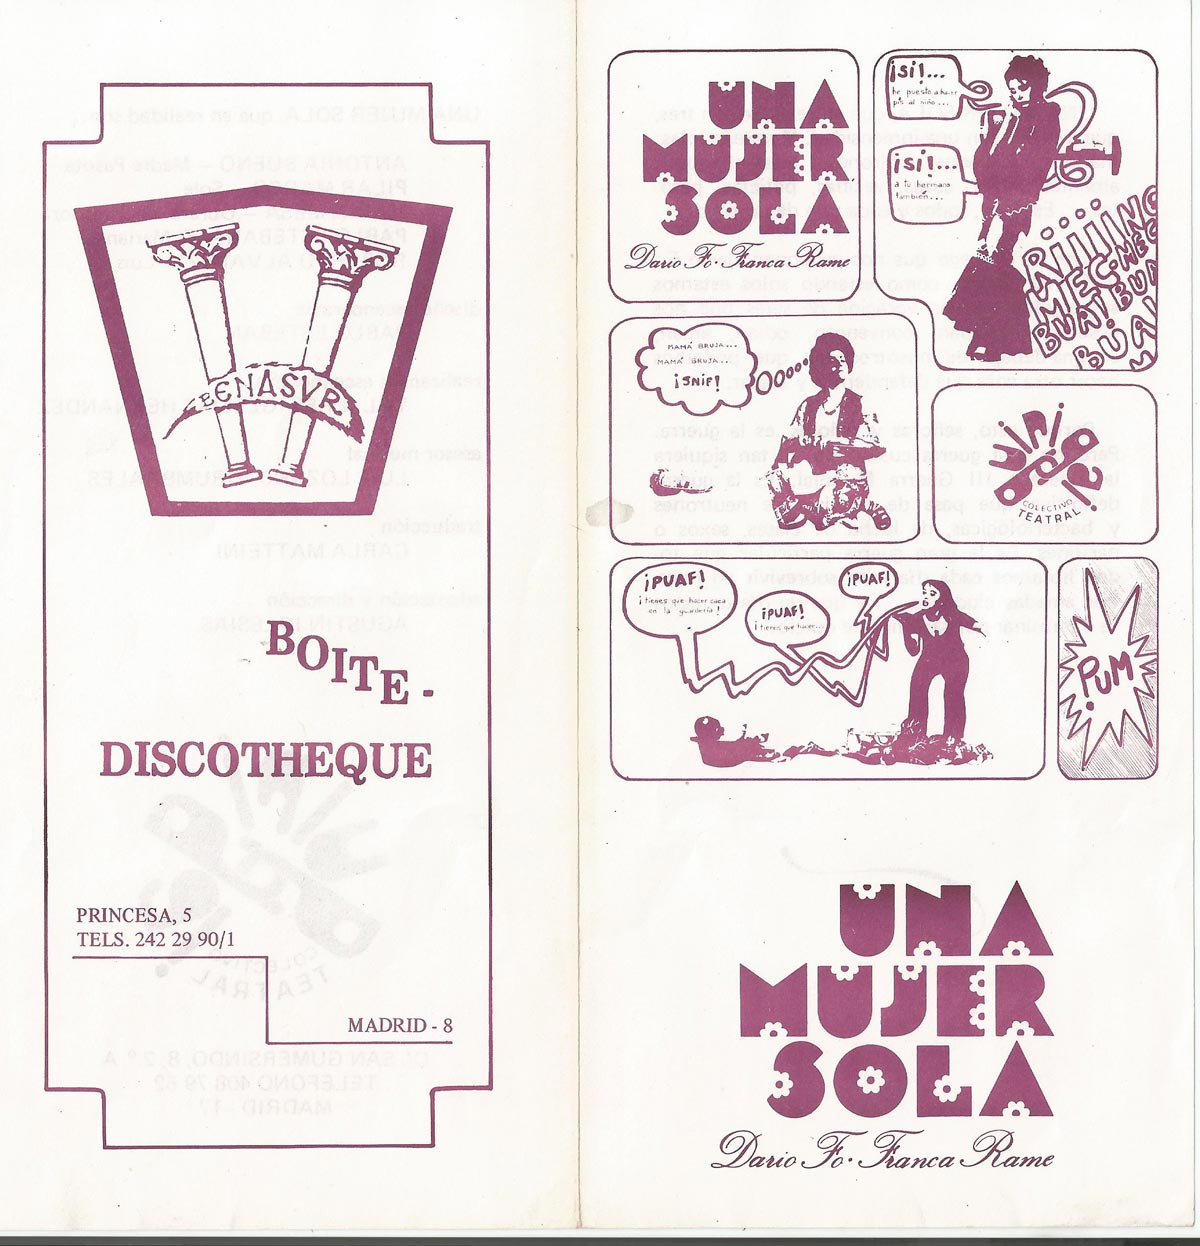 1981-Una-mujer-sola-guirigai-cartel-05